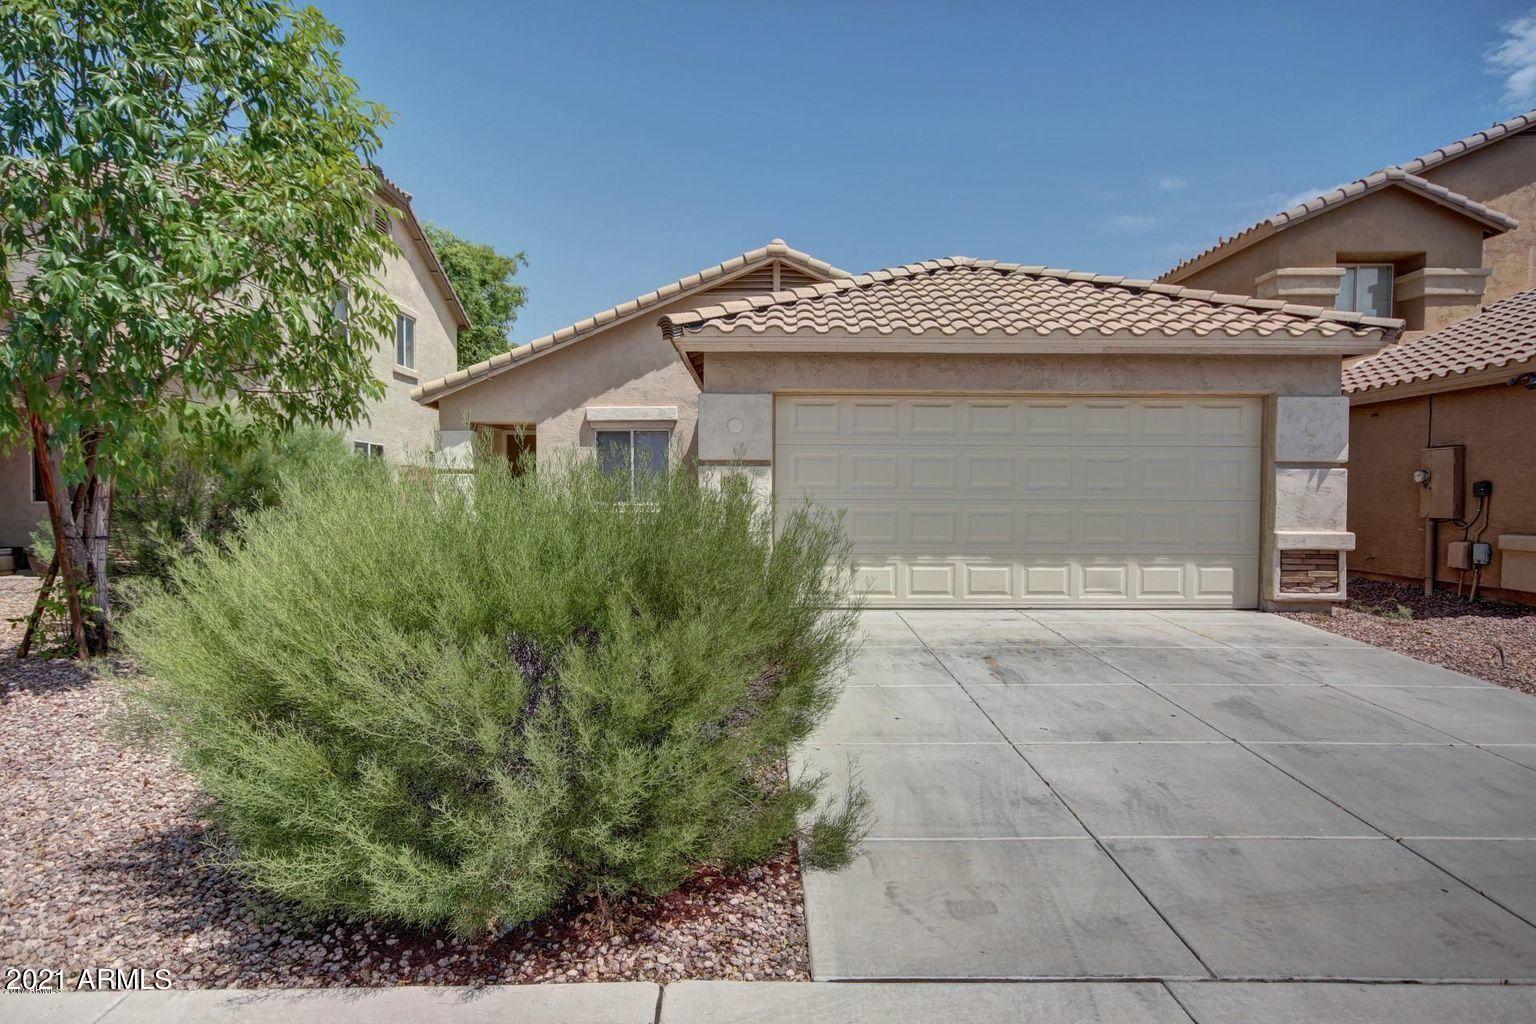 Photo of 11592 W DURAN Avenue, Youngtown, AZ 85363 (MLS # 6221414)